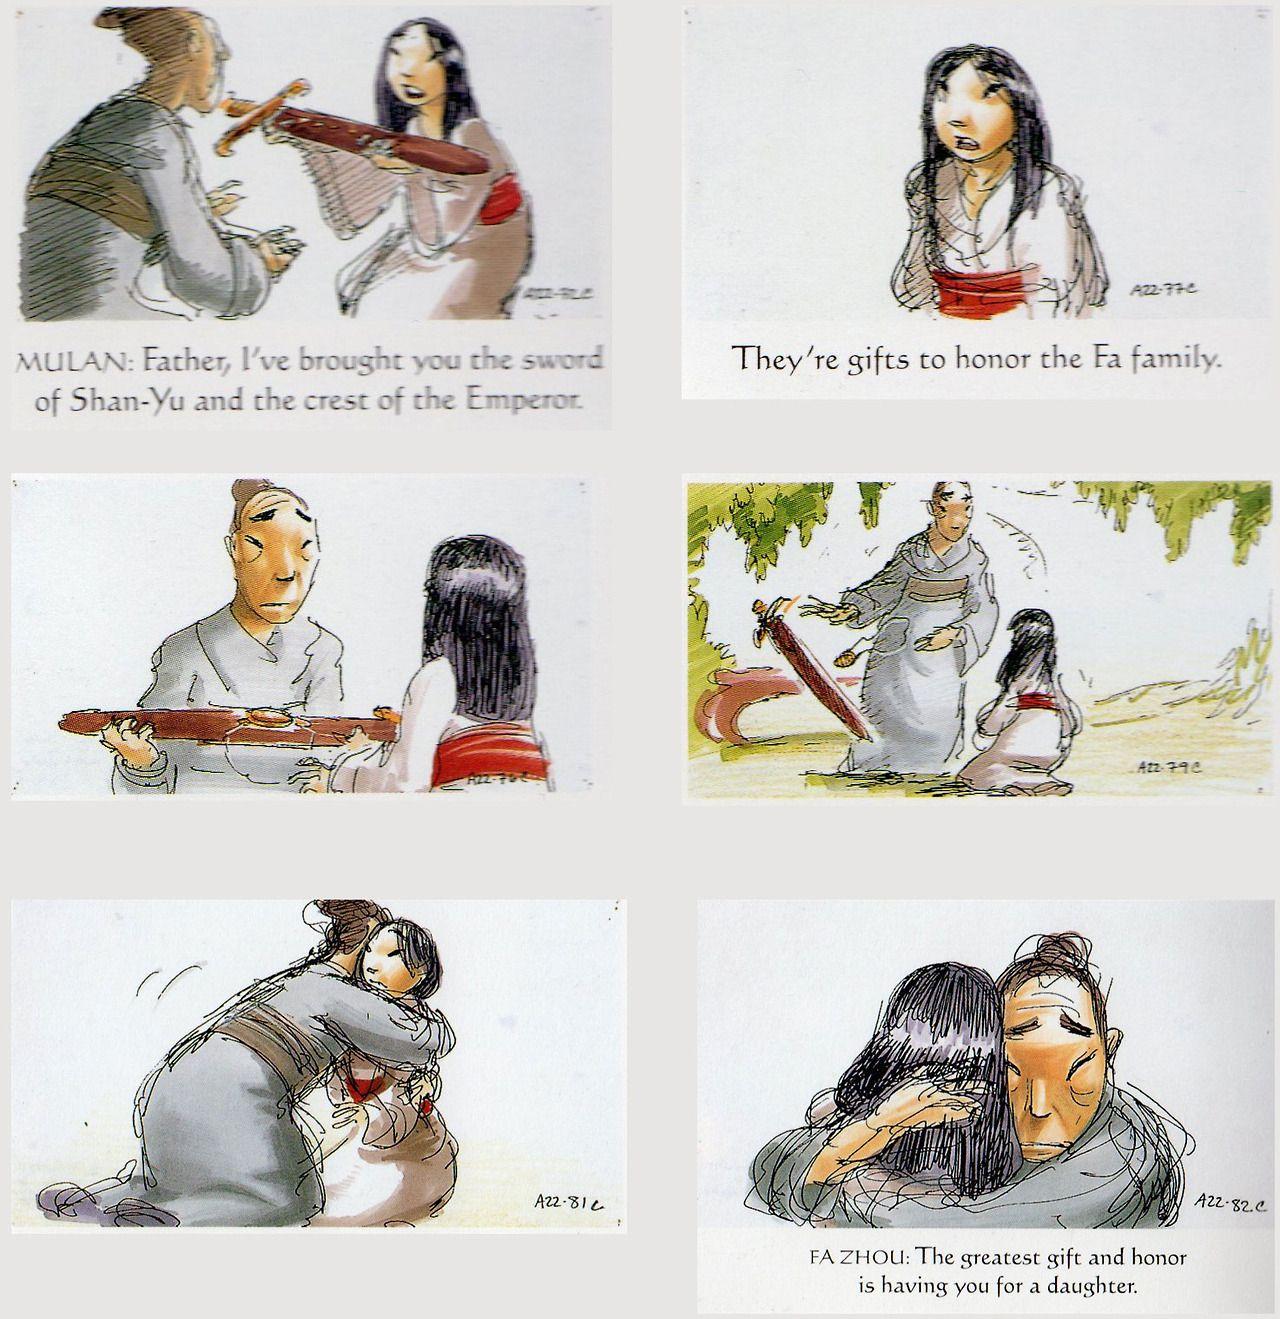 Mulan [Walt Disney - 1998] - Page 6 485744409ac587e4b71806696877b9a6